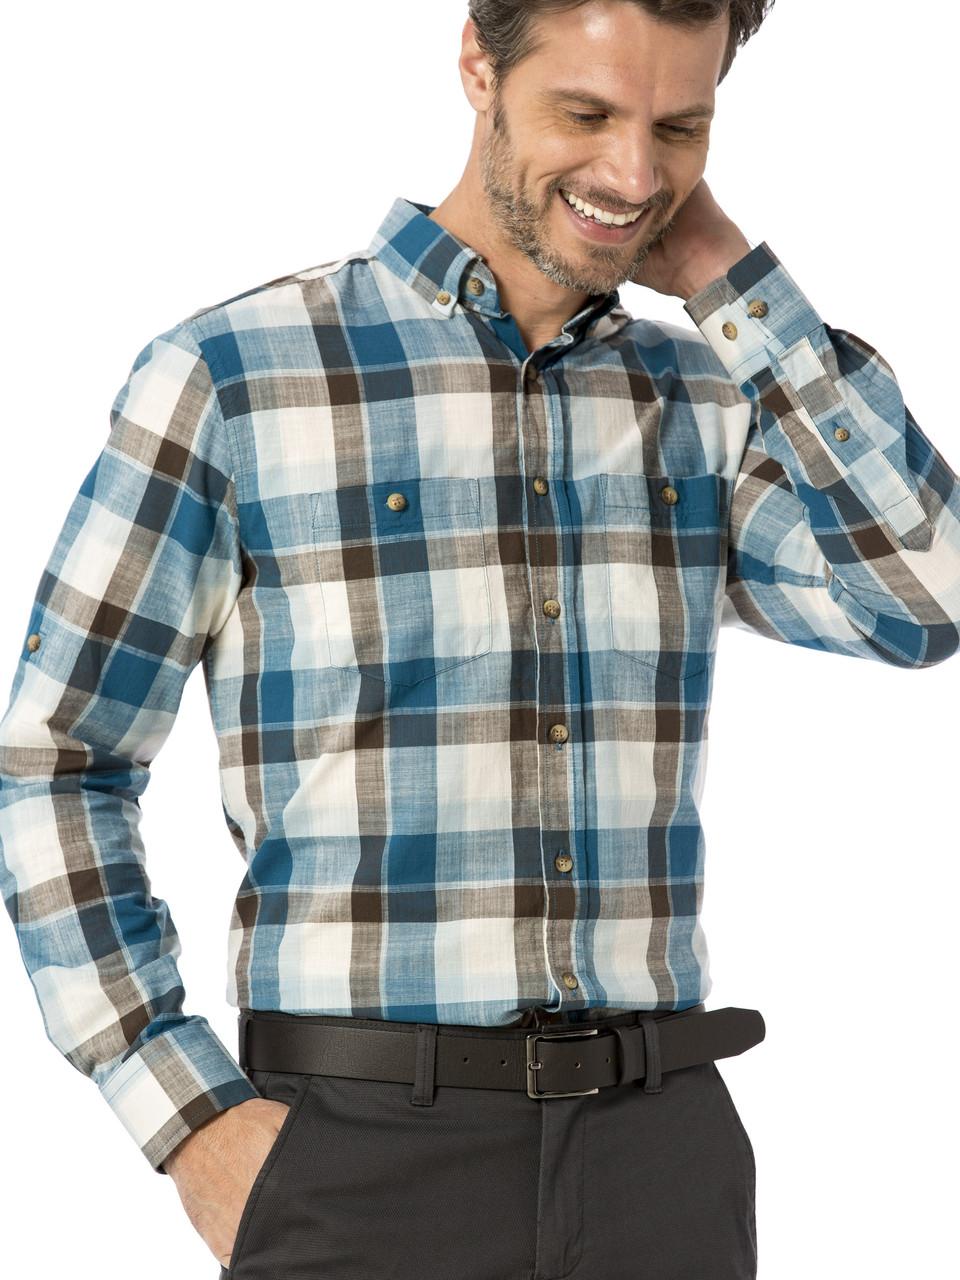 Мужская рубашка LC Waikiki / ЛС Вайкики в бирюзово-коричневую клетку, с карманами и пуговицами на воротнике